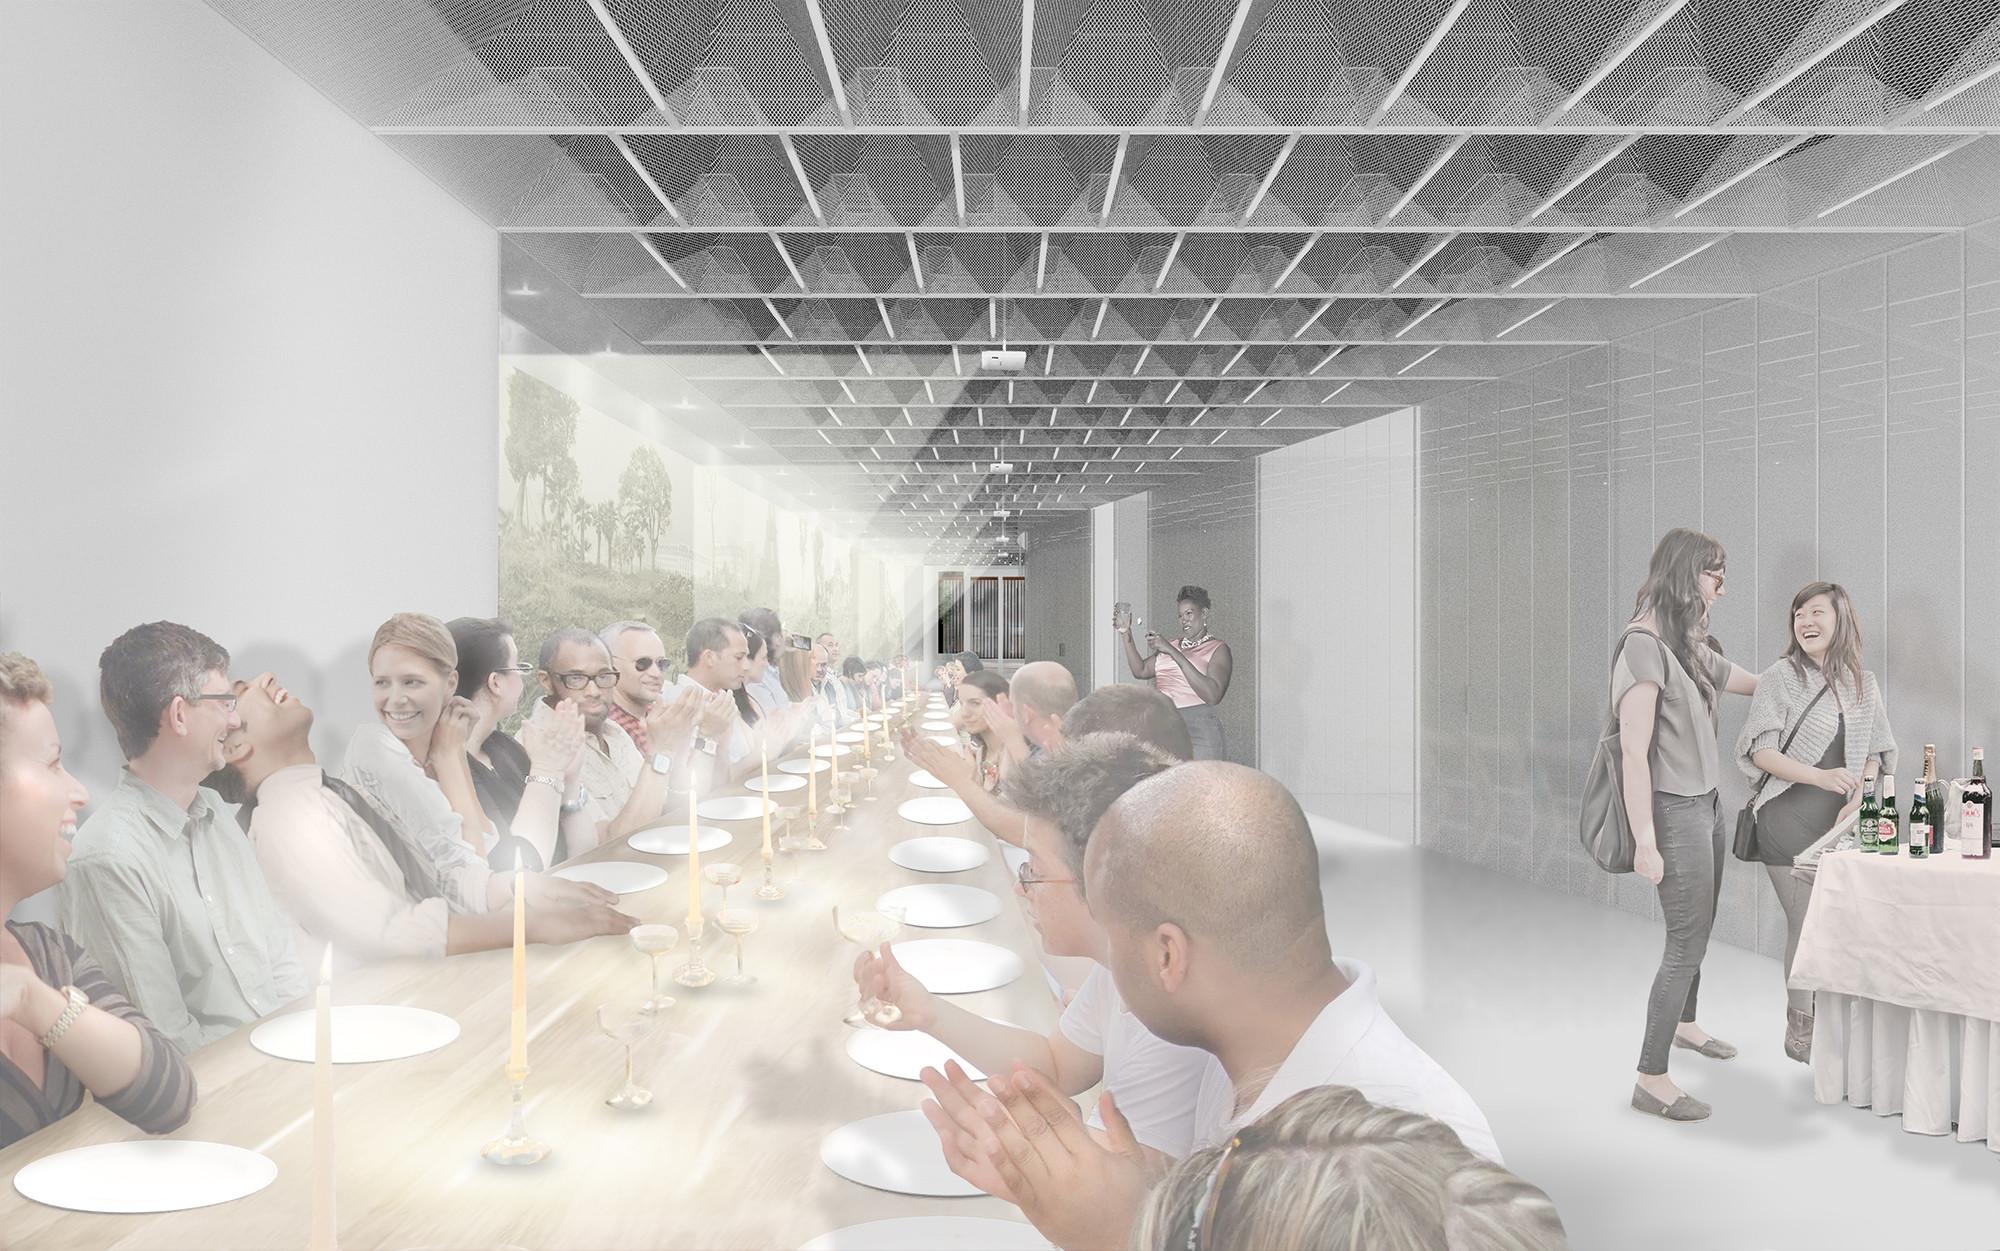 Dinner scenario. Image © Collective-LOK